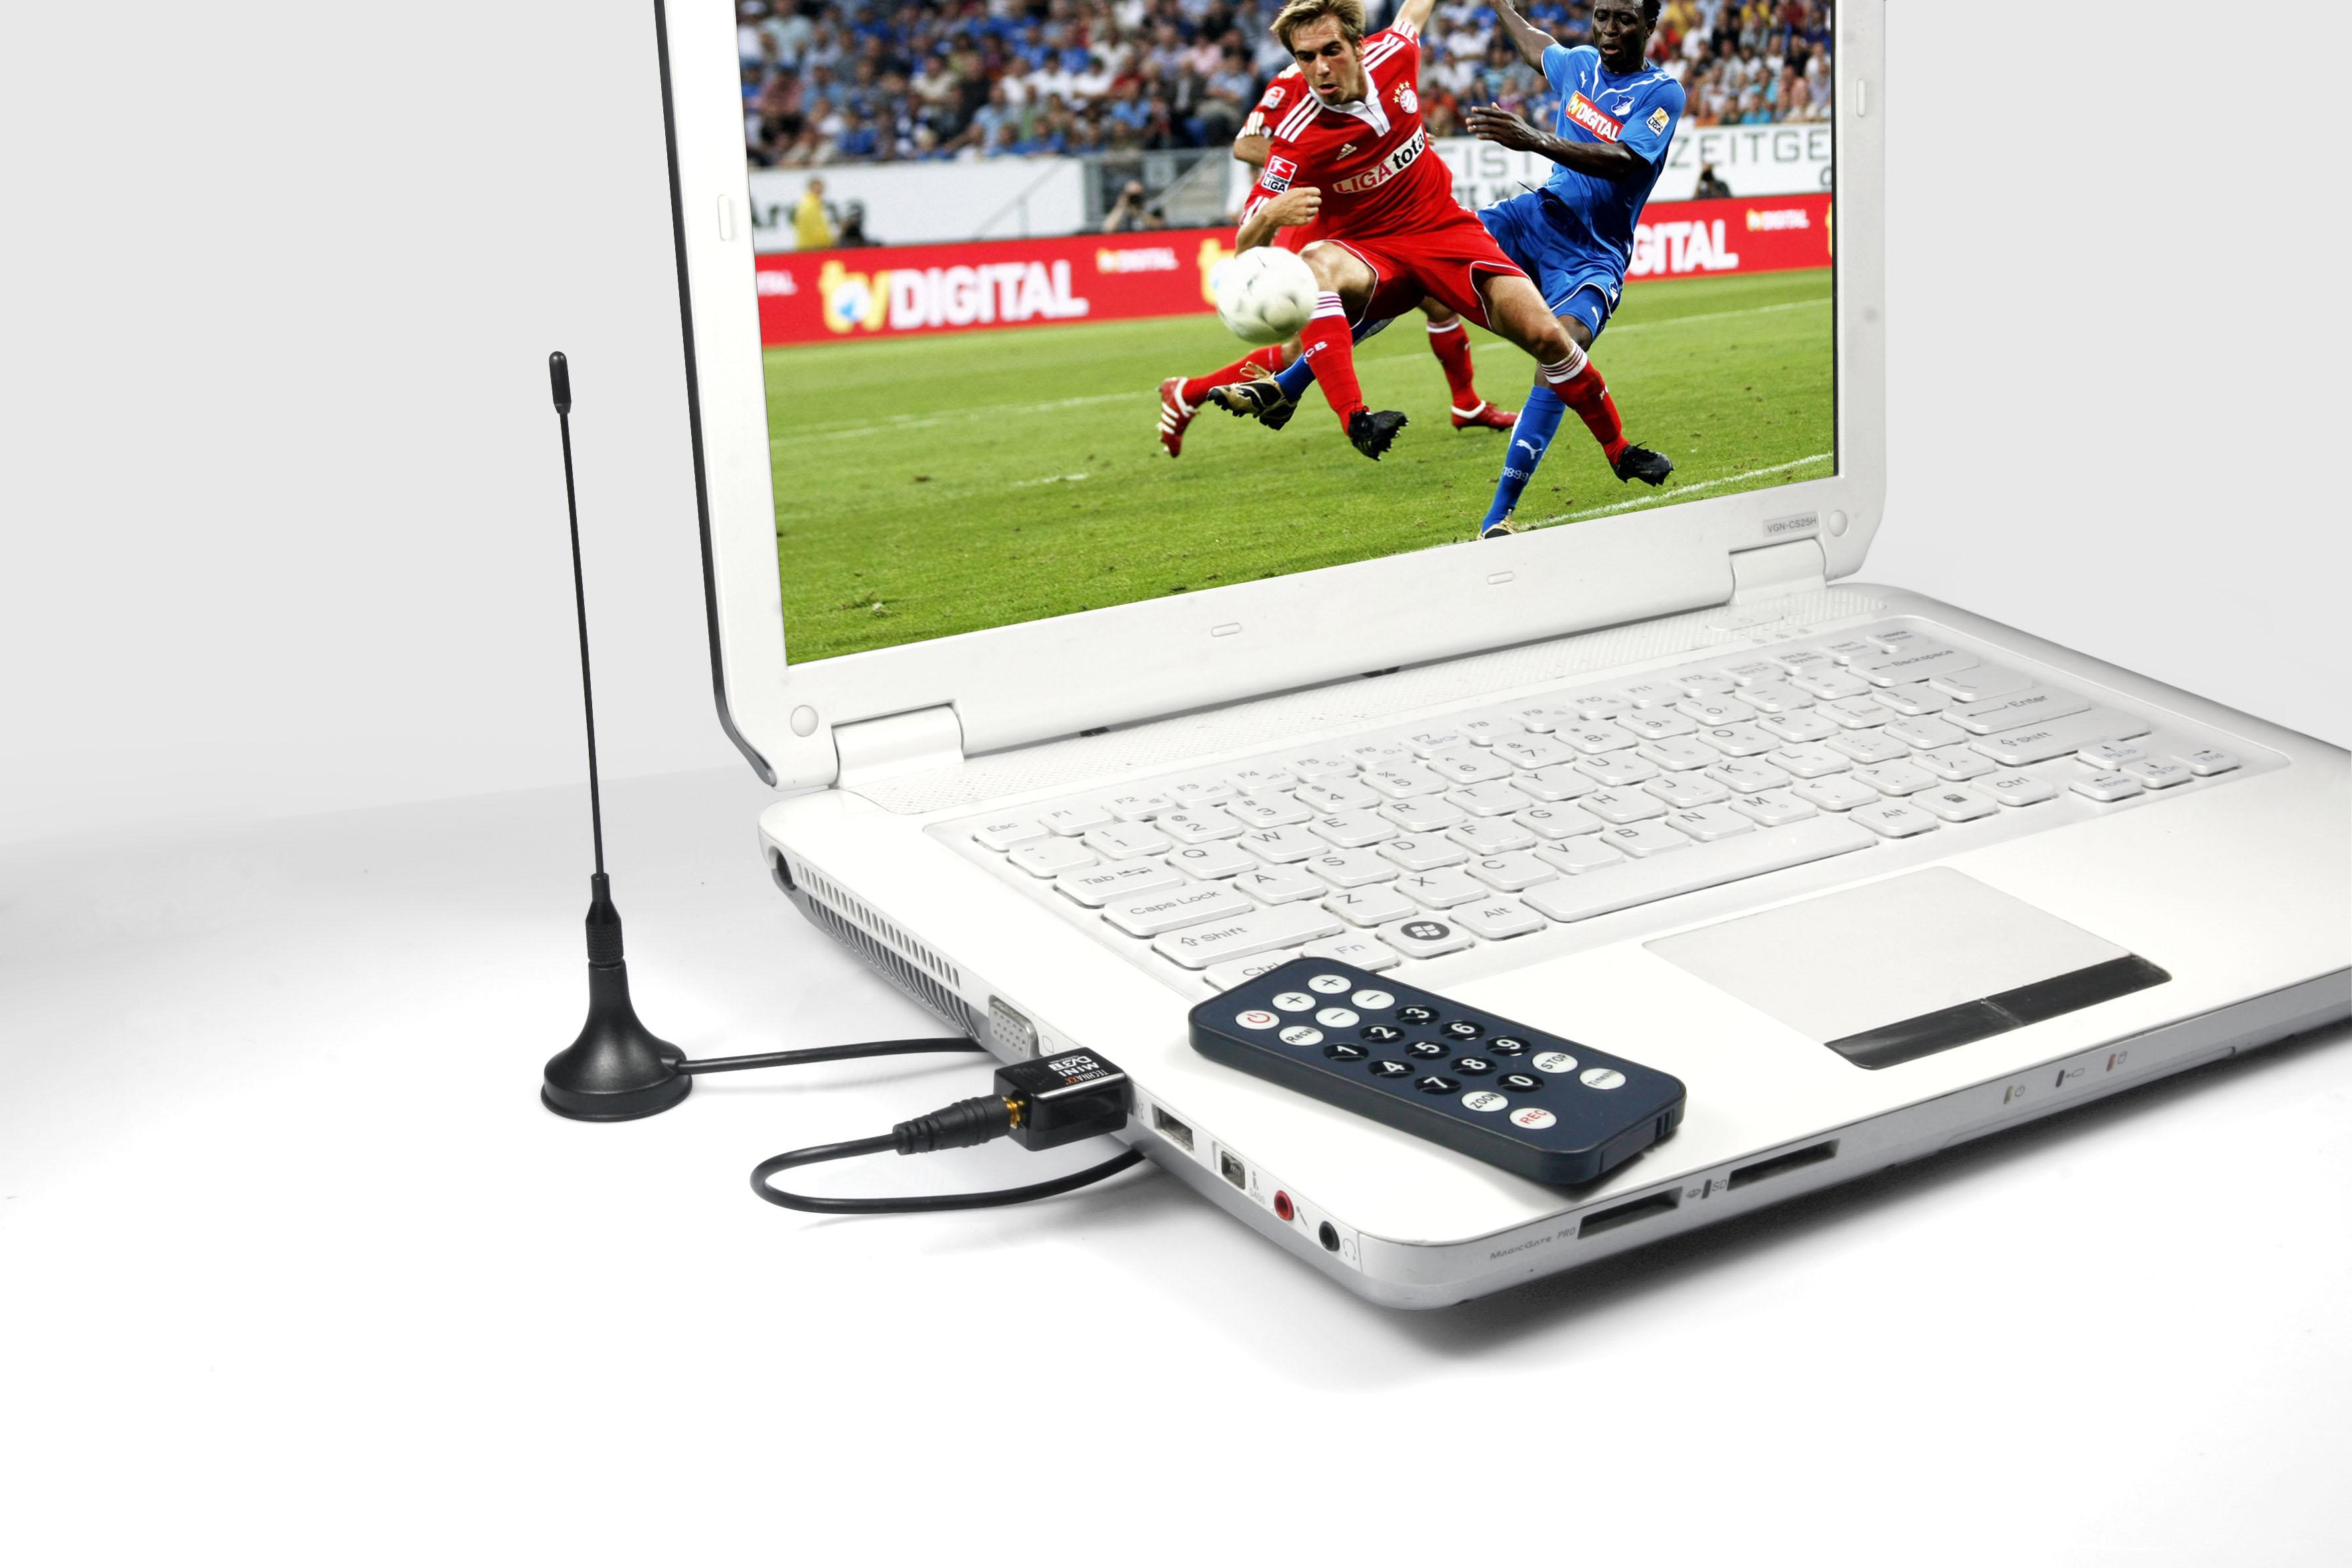 Technaxx USB tuner DVB S6 - DVB-T, HDTV, MPEG2/4